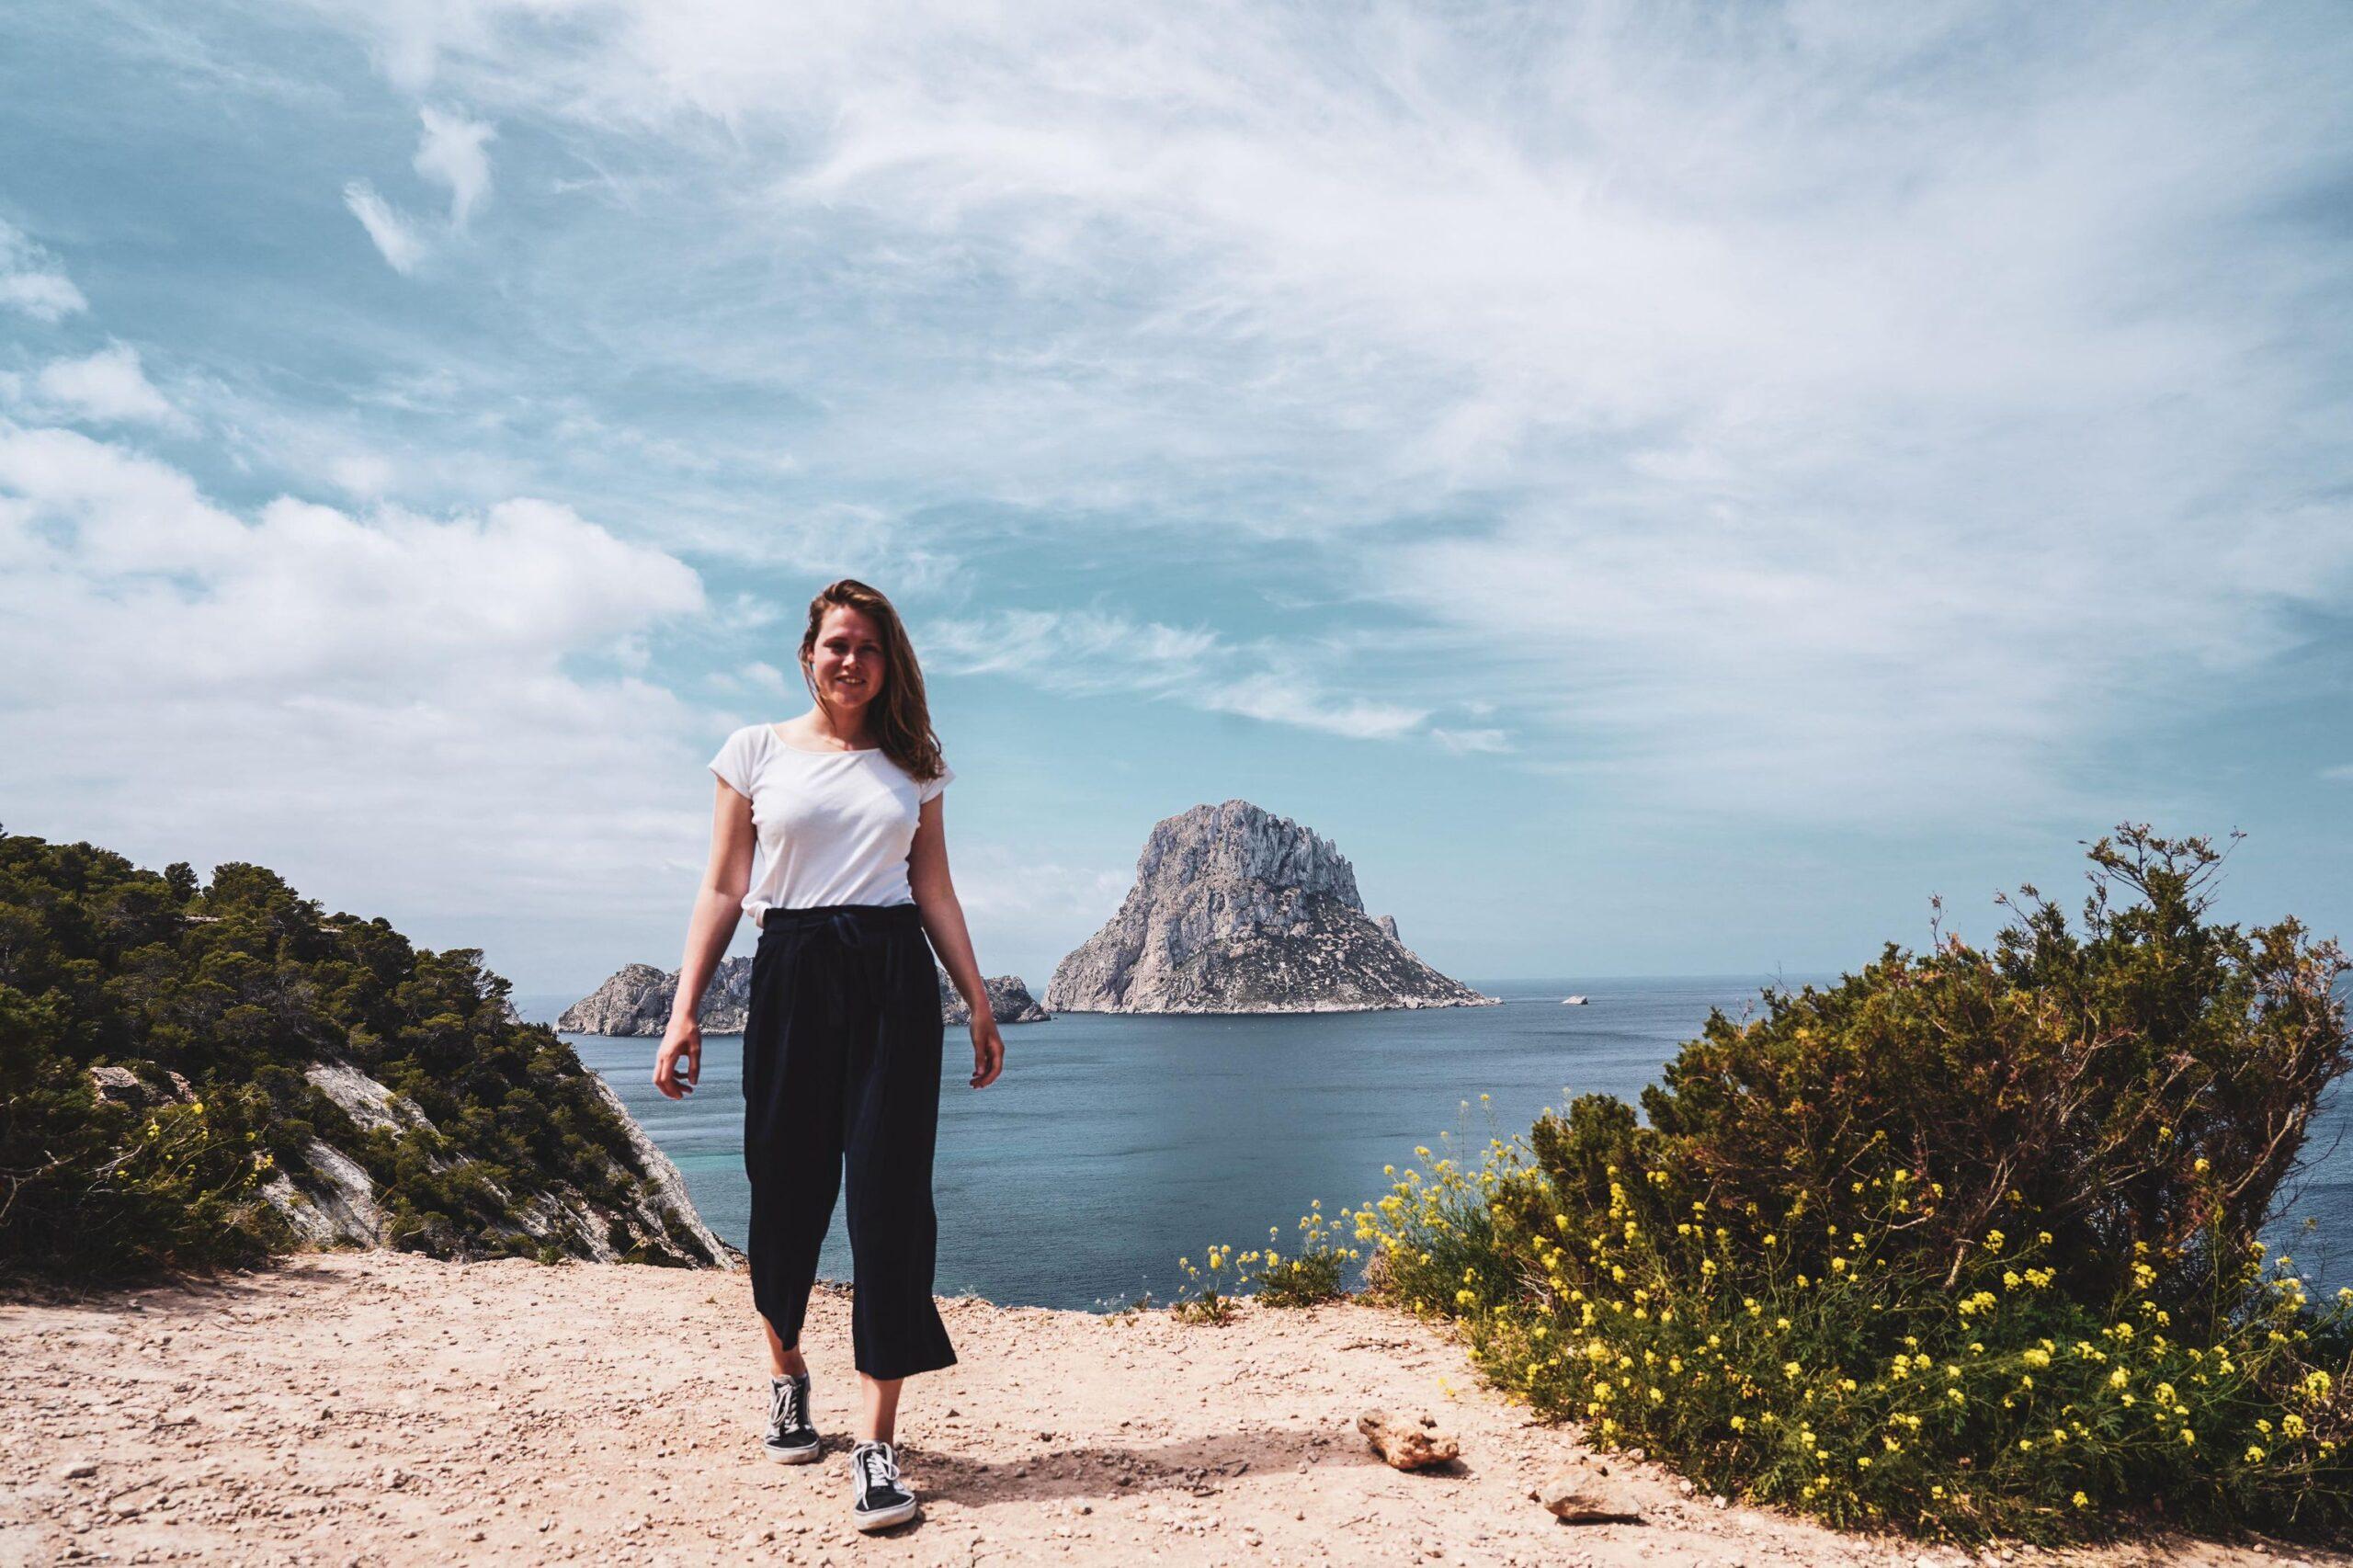 Wat te doen op Ibiza - travelnote